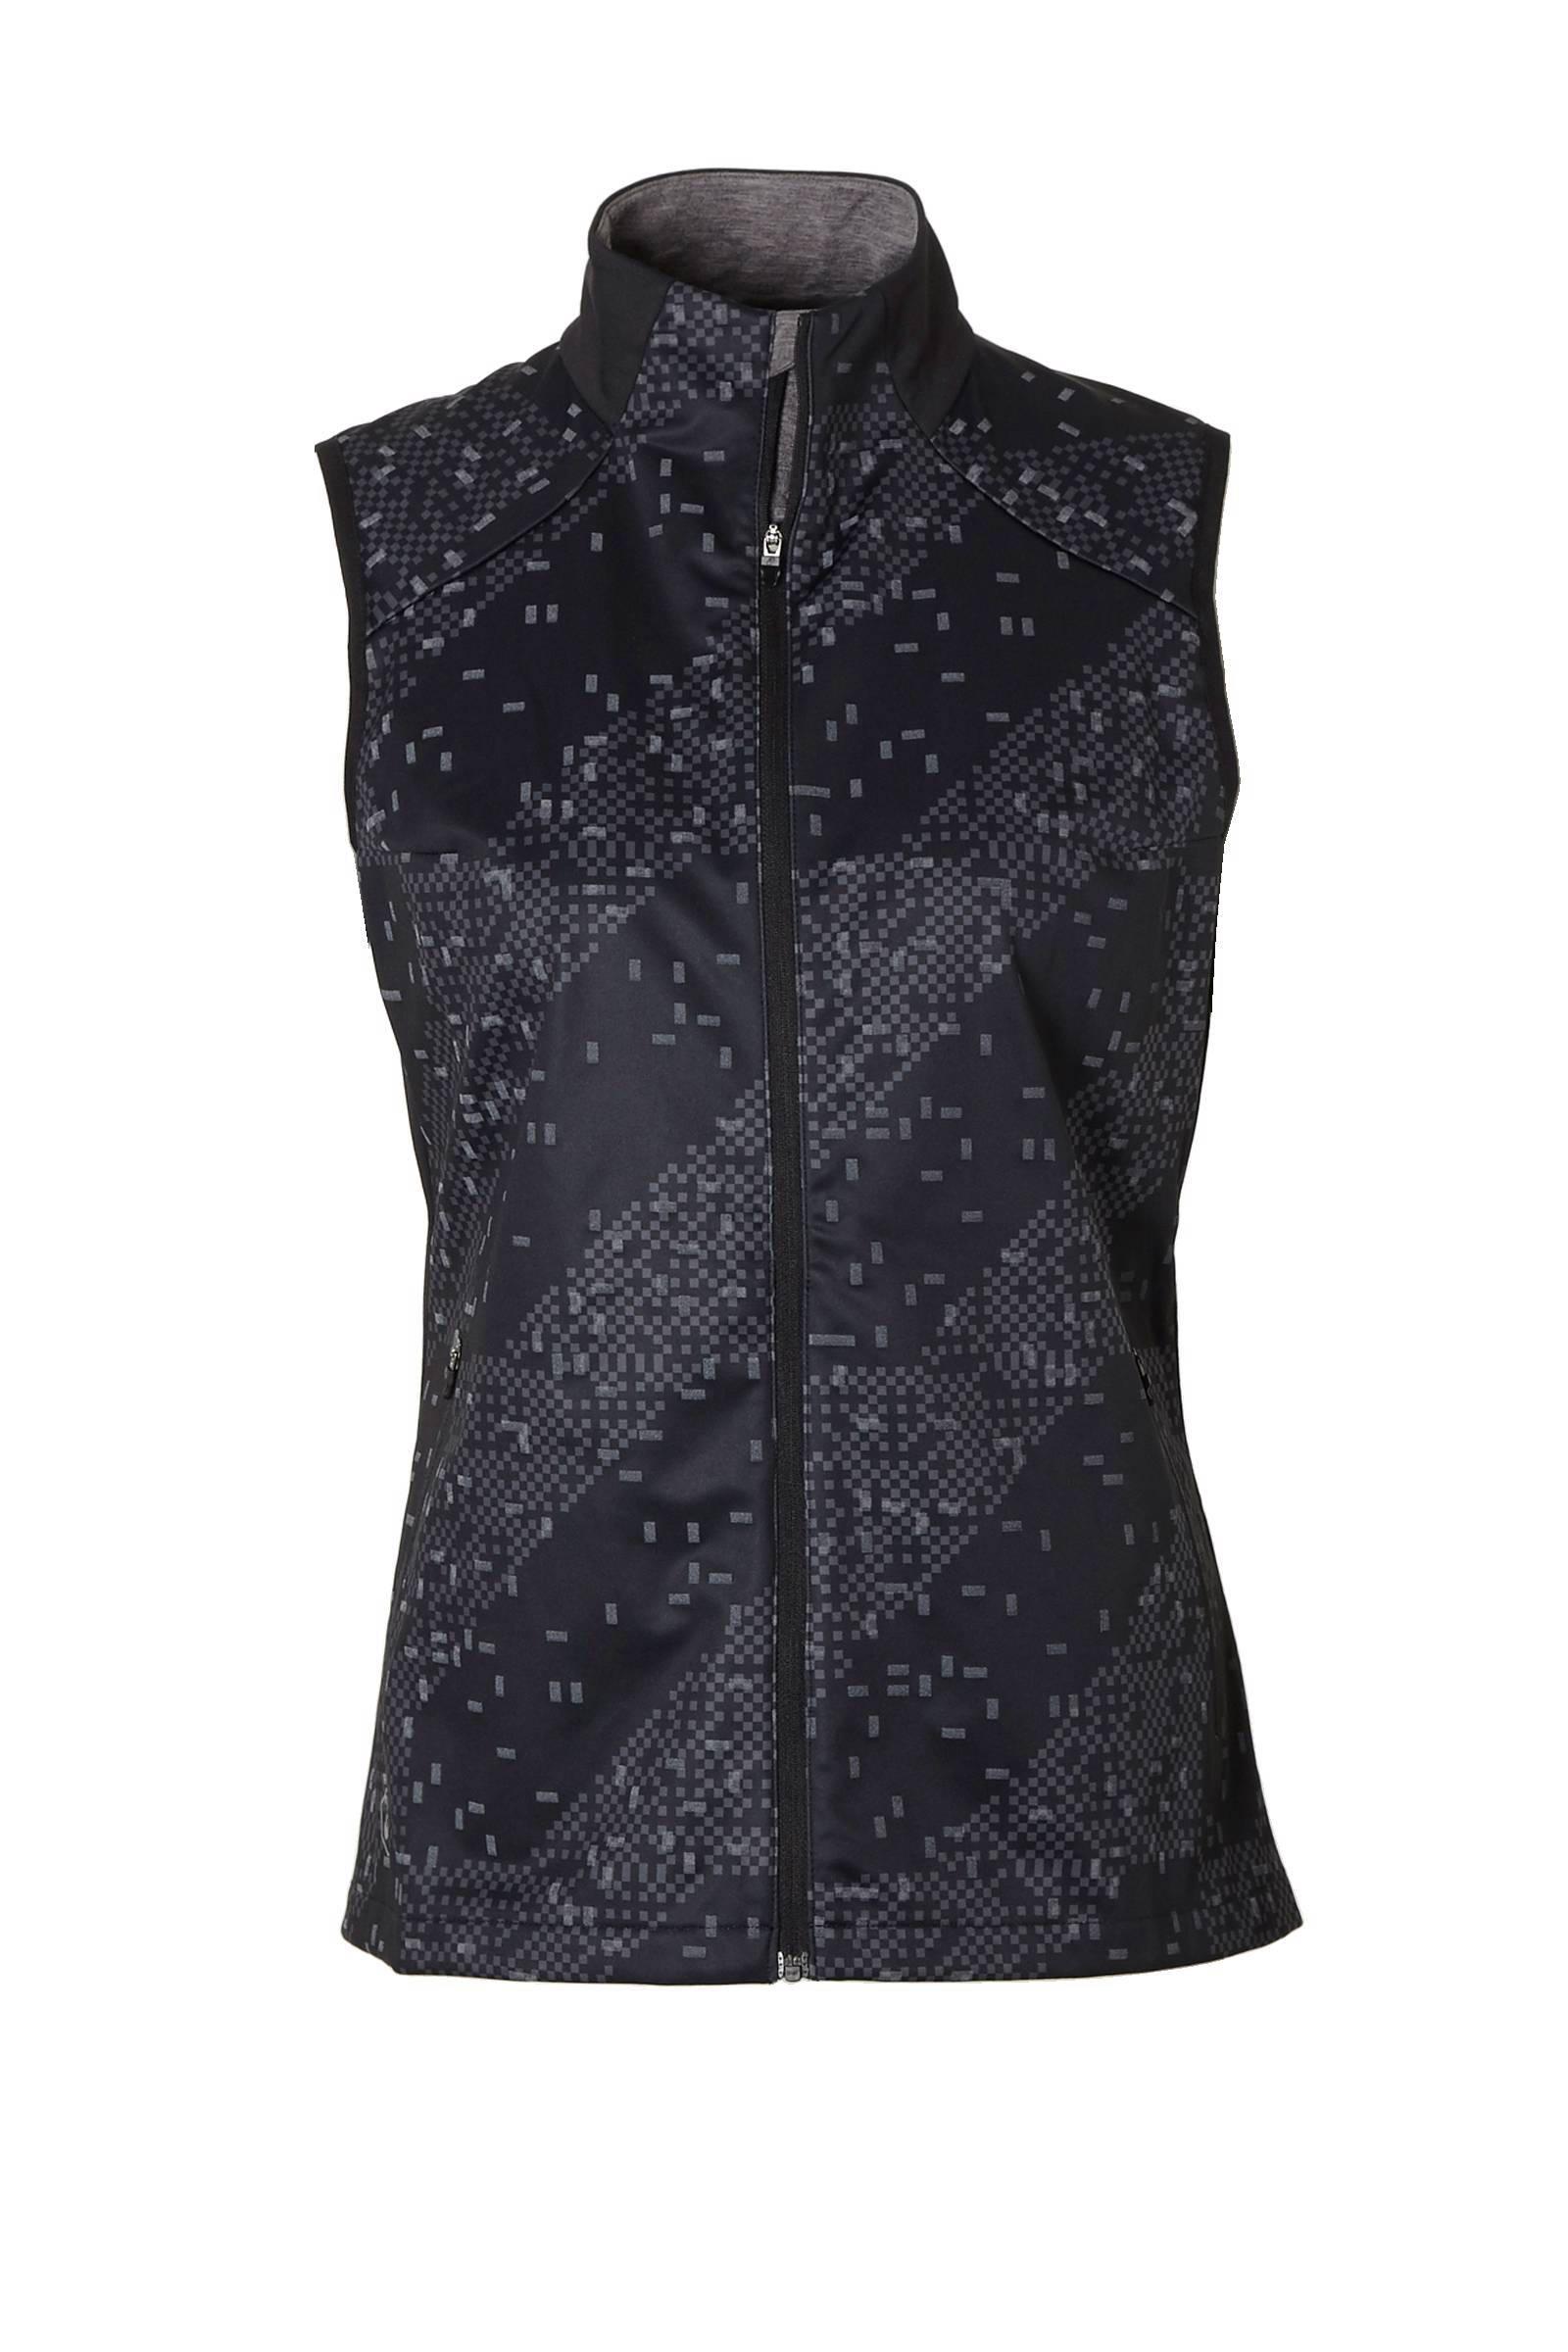 Jacken & Mäntel Men's Vintage Leather Biker Waistcoat Gilet Vest 44r 2019 New Fashion Style Online Herrenmode